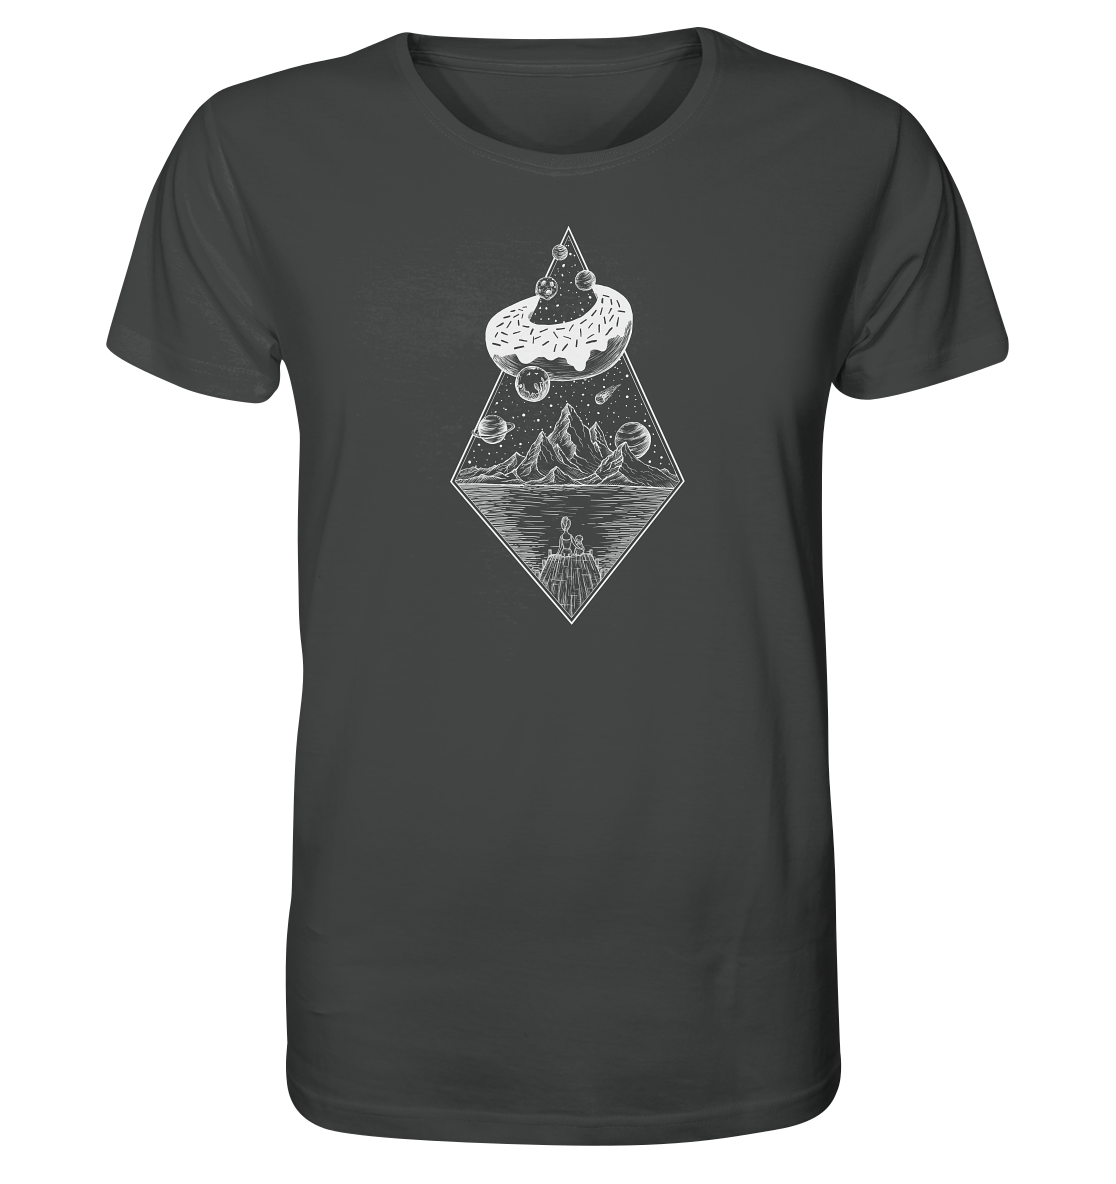 front-organic-shirt-444545-1116x-1.png